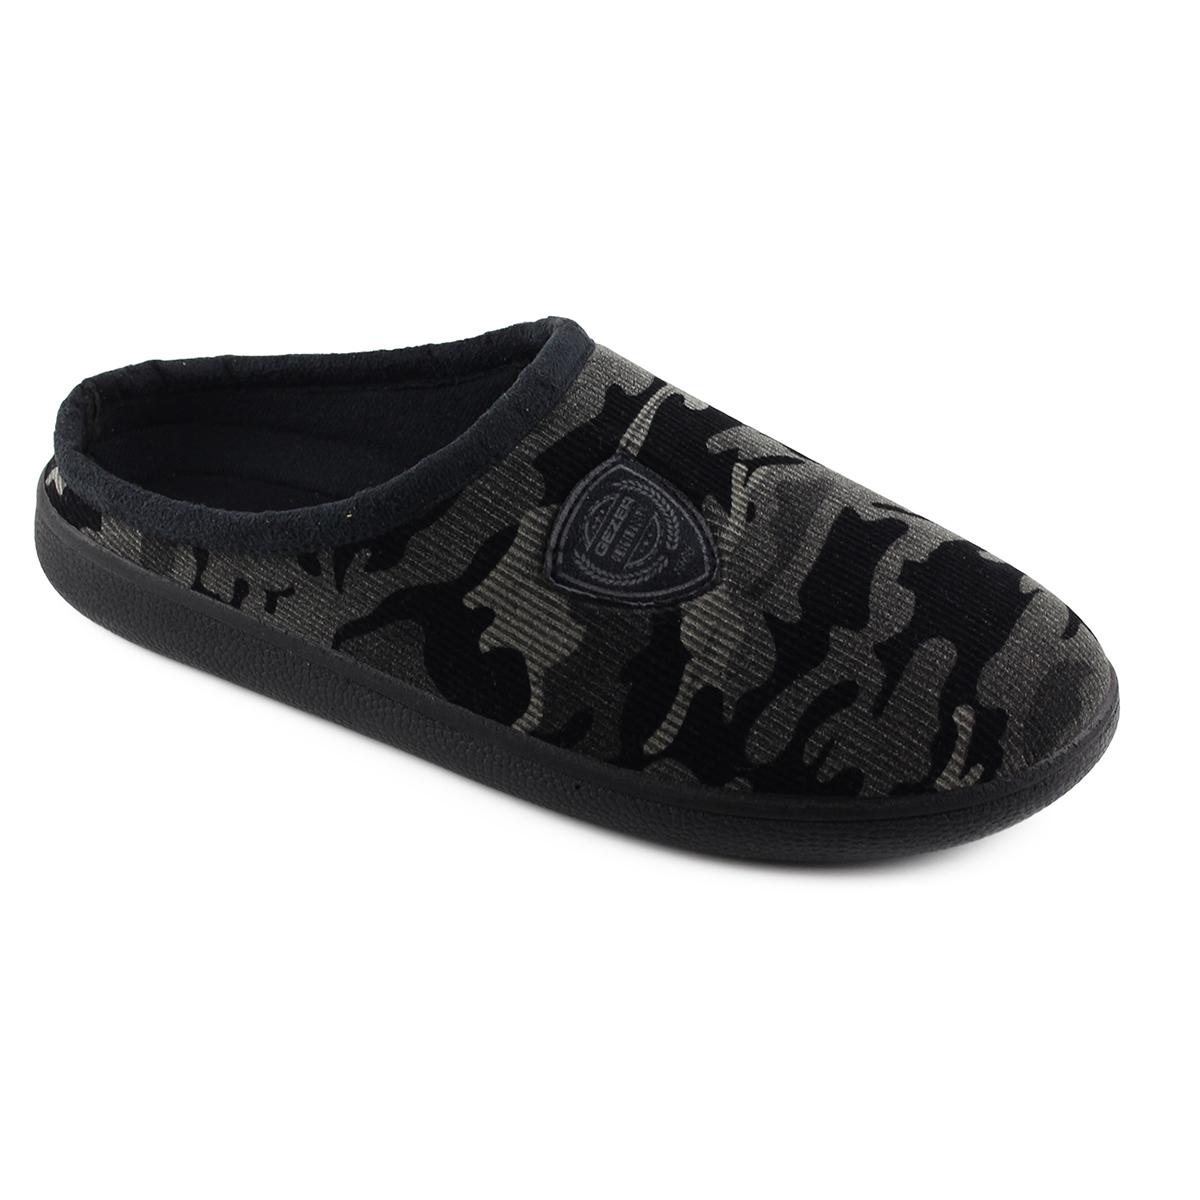 Gezer winter slipper